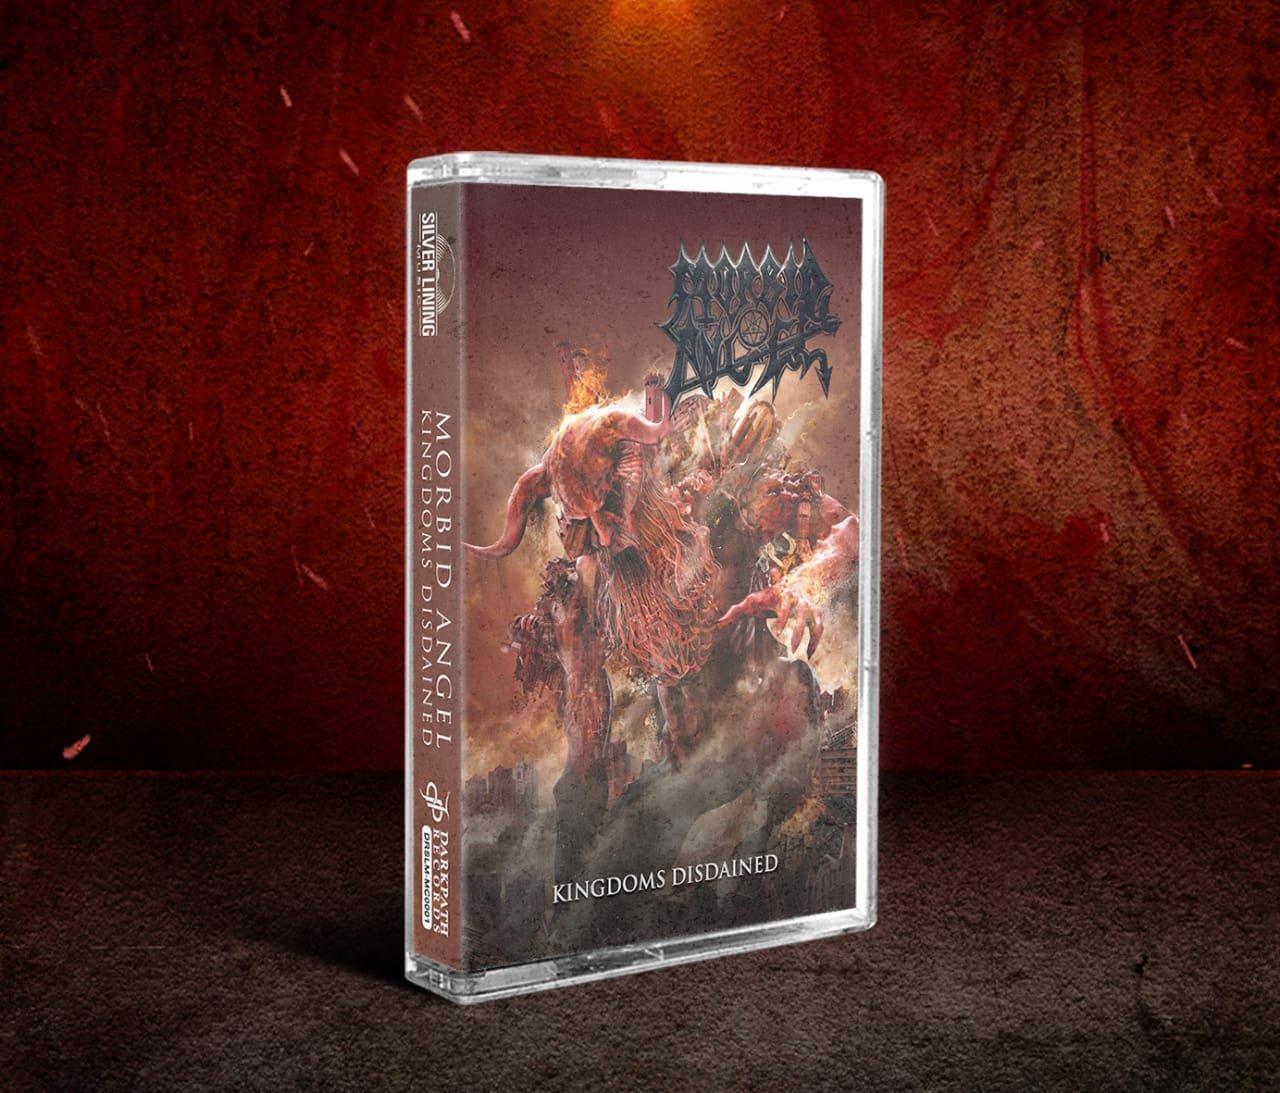 Image of MORBID ANGEL - Kingdoms Disdained CD & Cassette